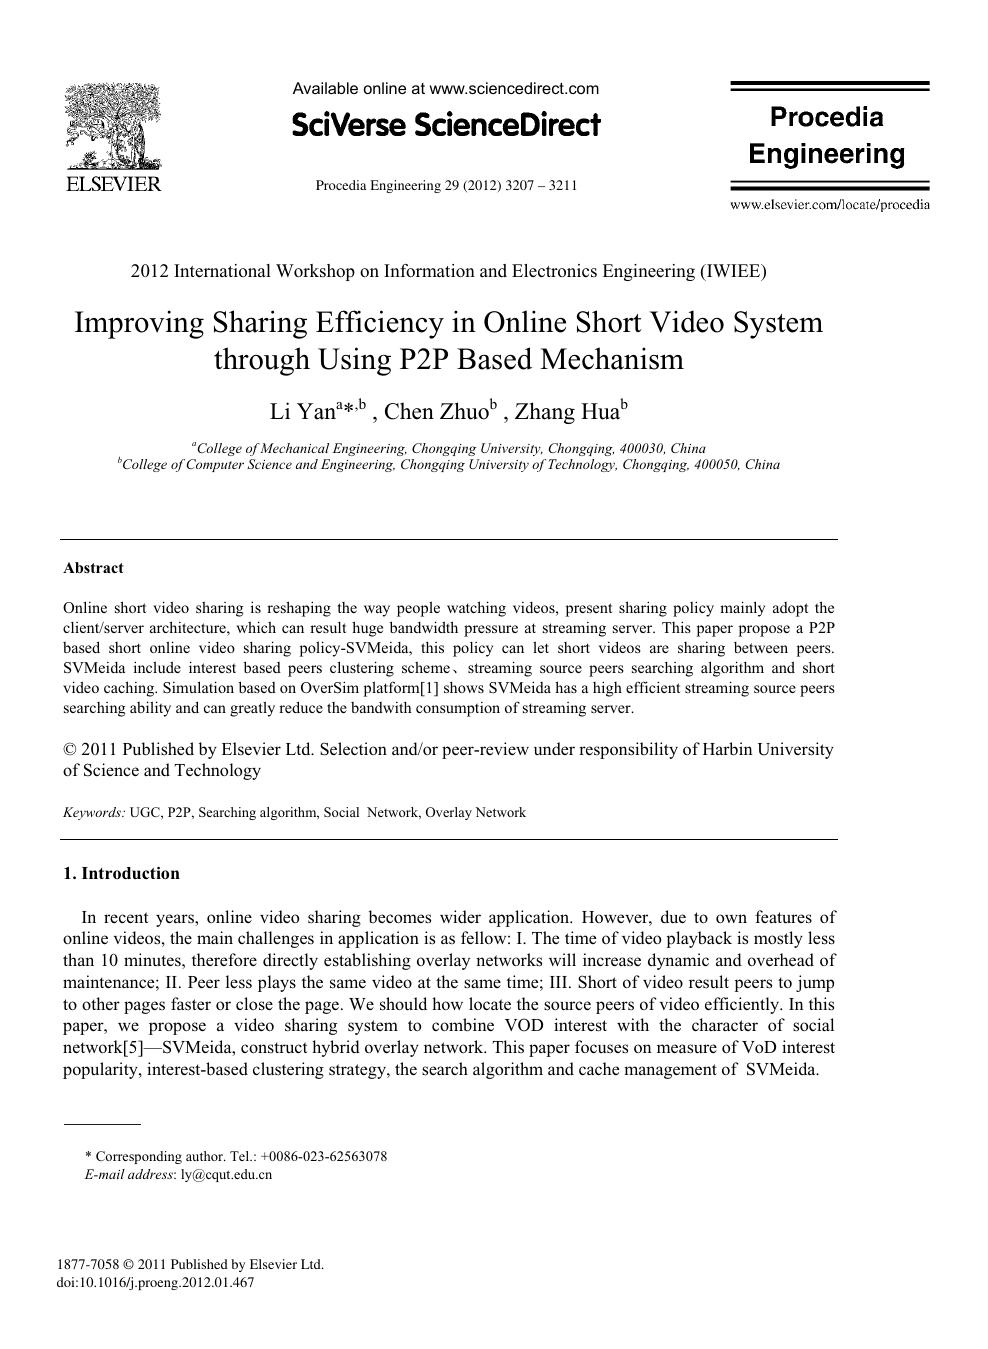 Improving Sharing Efficiency in Online Short Video System